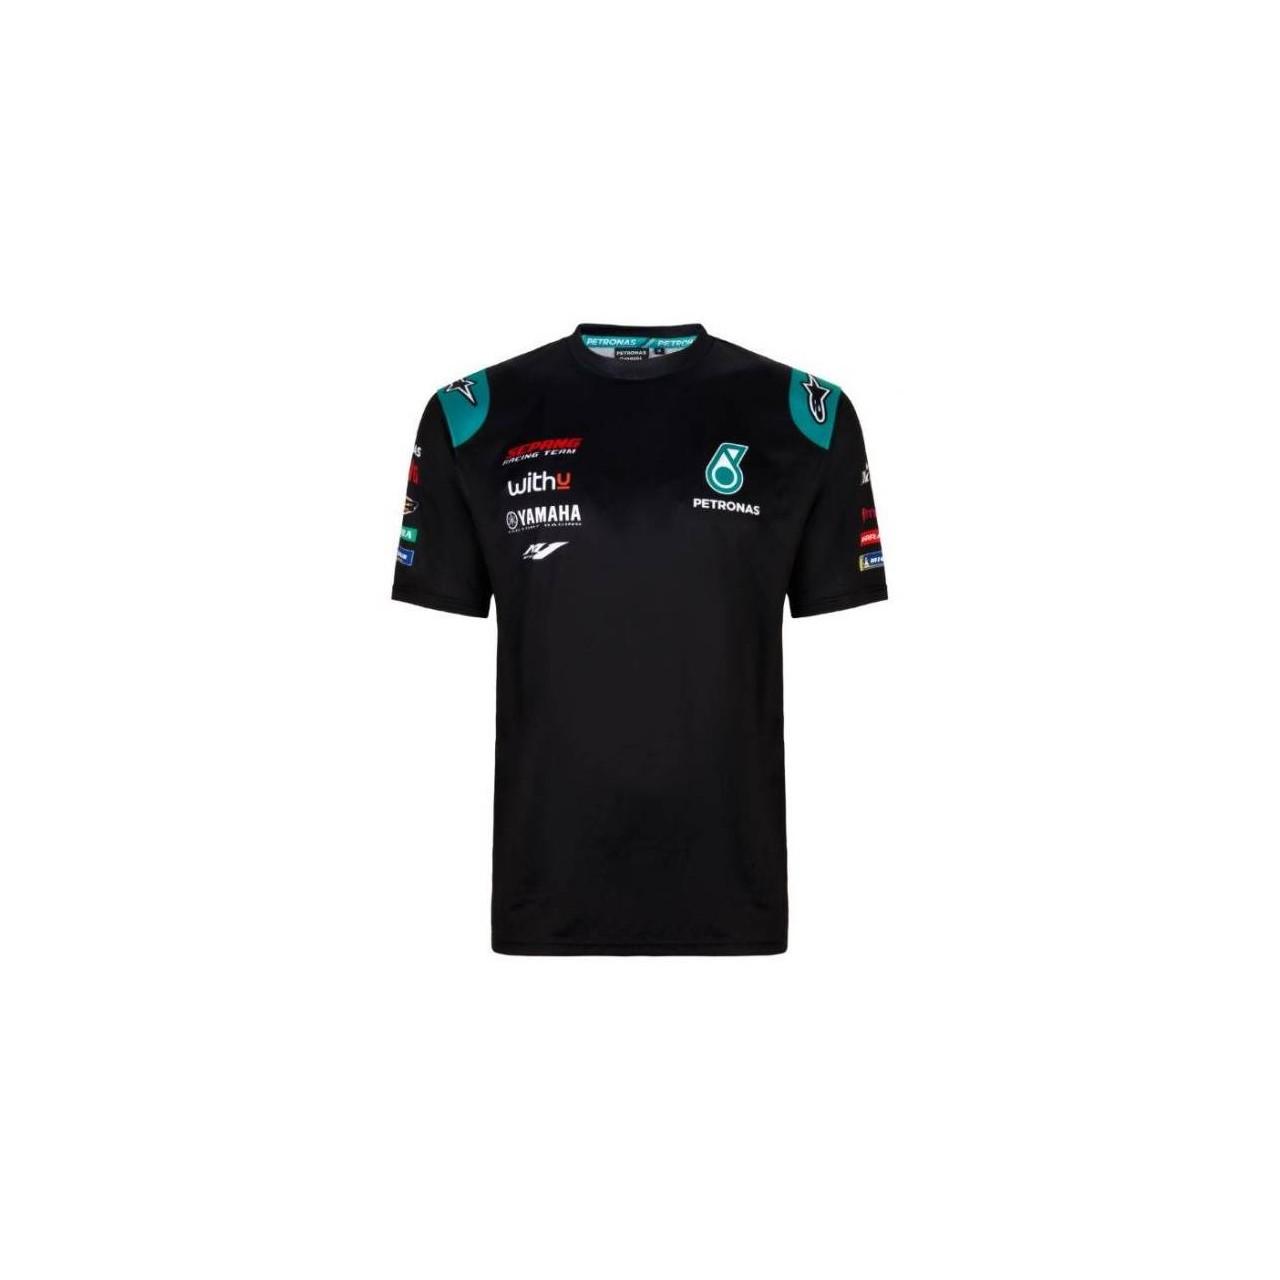 YAMAHA T-Shirt Homme Petronas 2020